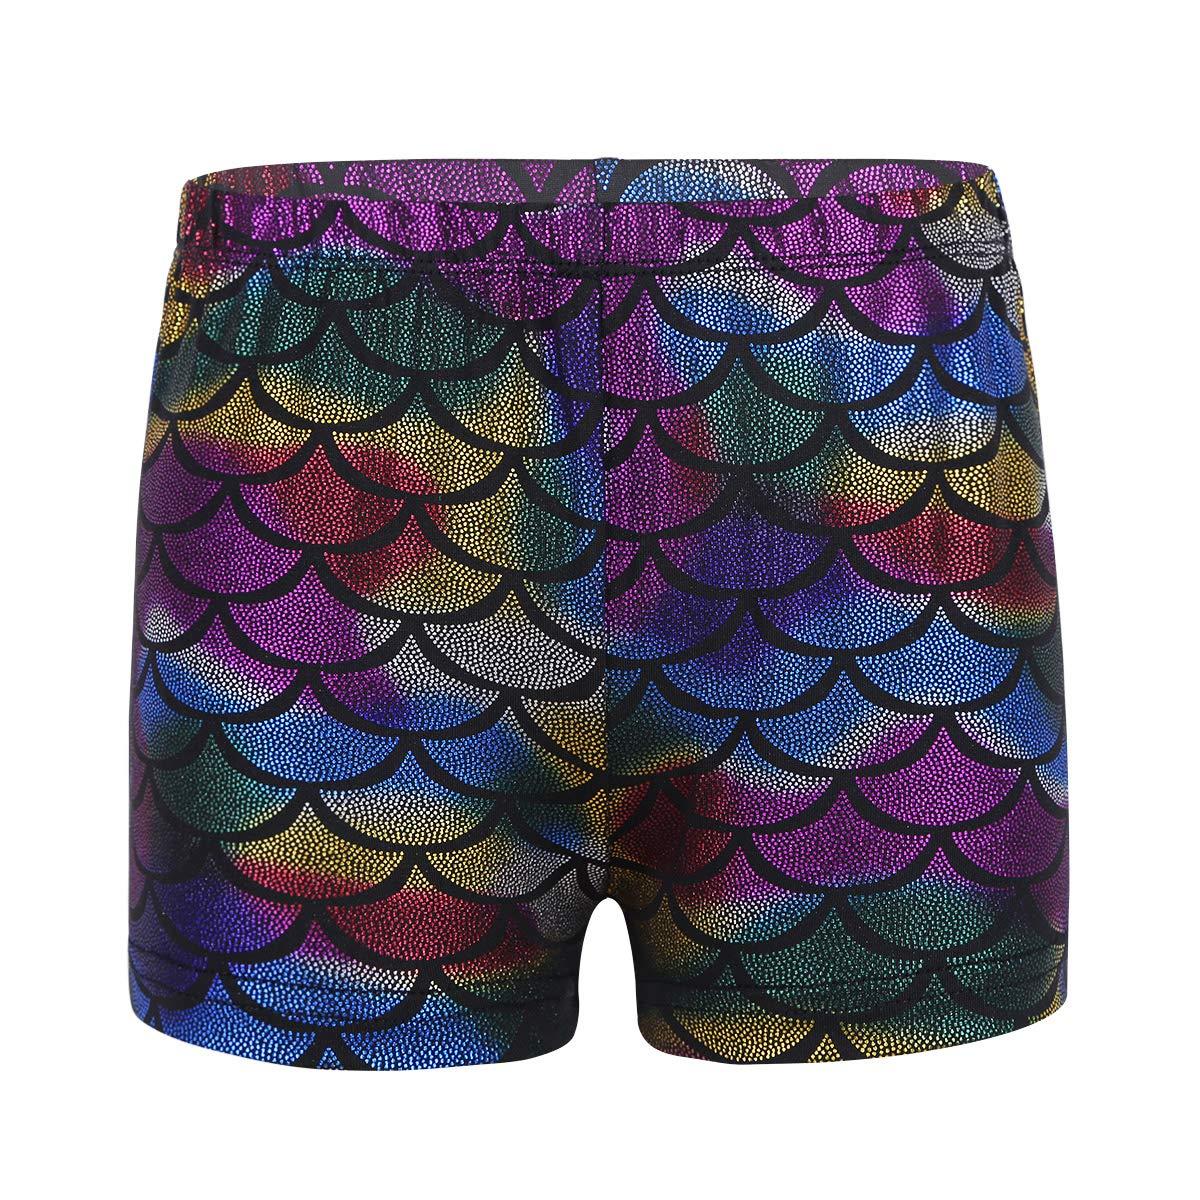 Freebily Girls Boy-Cut Shorts Low Rise Solid Booty Bottoms Dance Underwear Colorful1 10